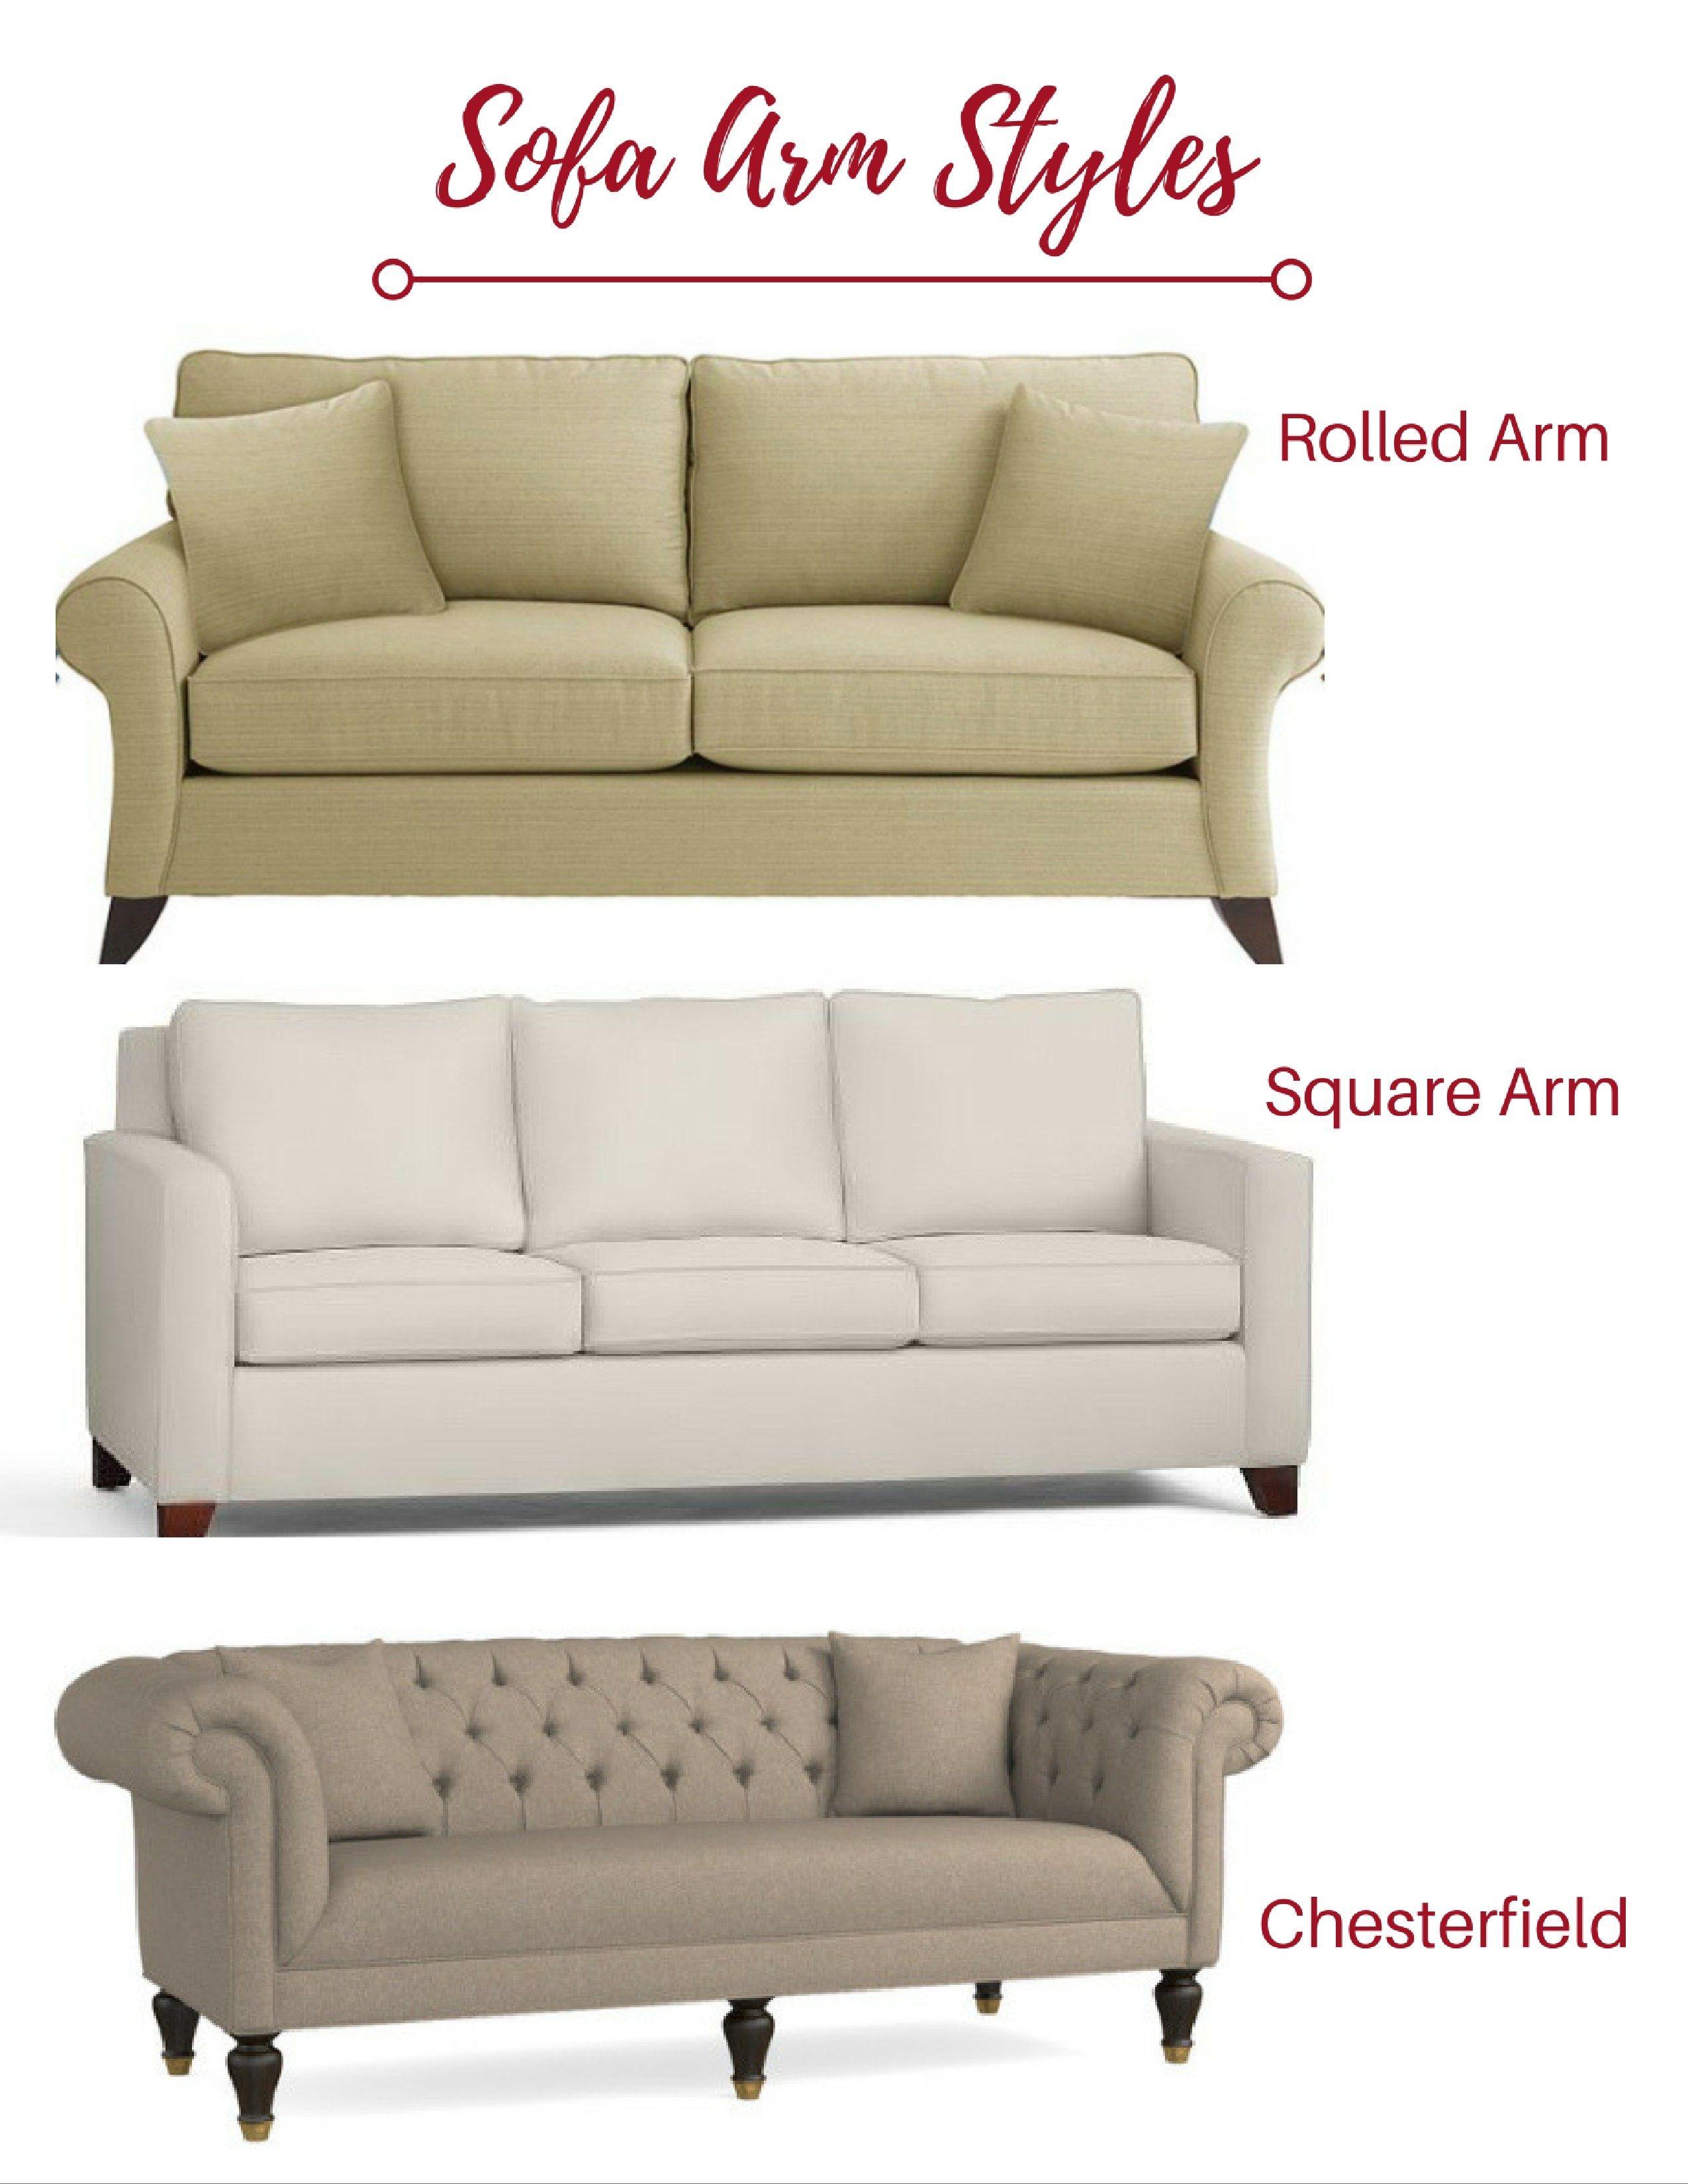 Nice Sofa Arm Styles Elegant Sofa Arm Styles 13 In